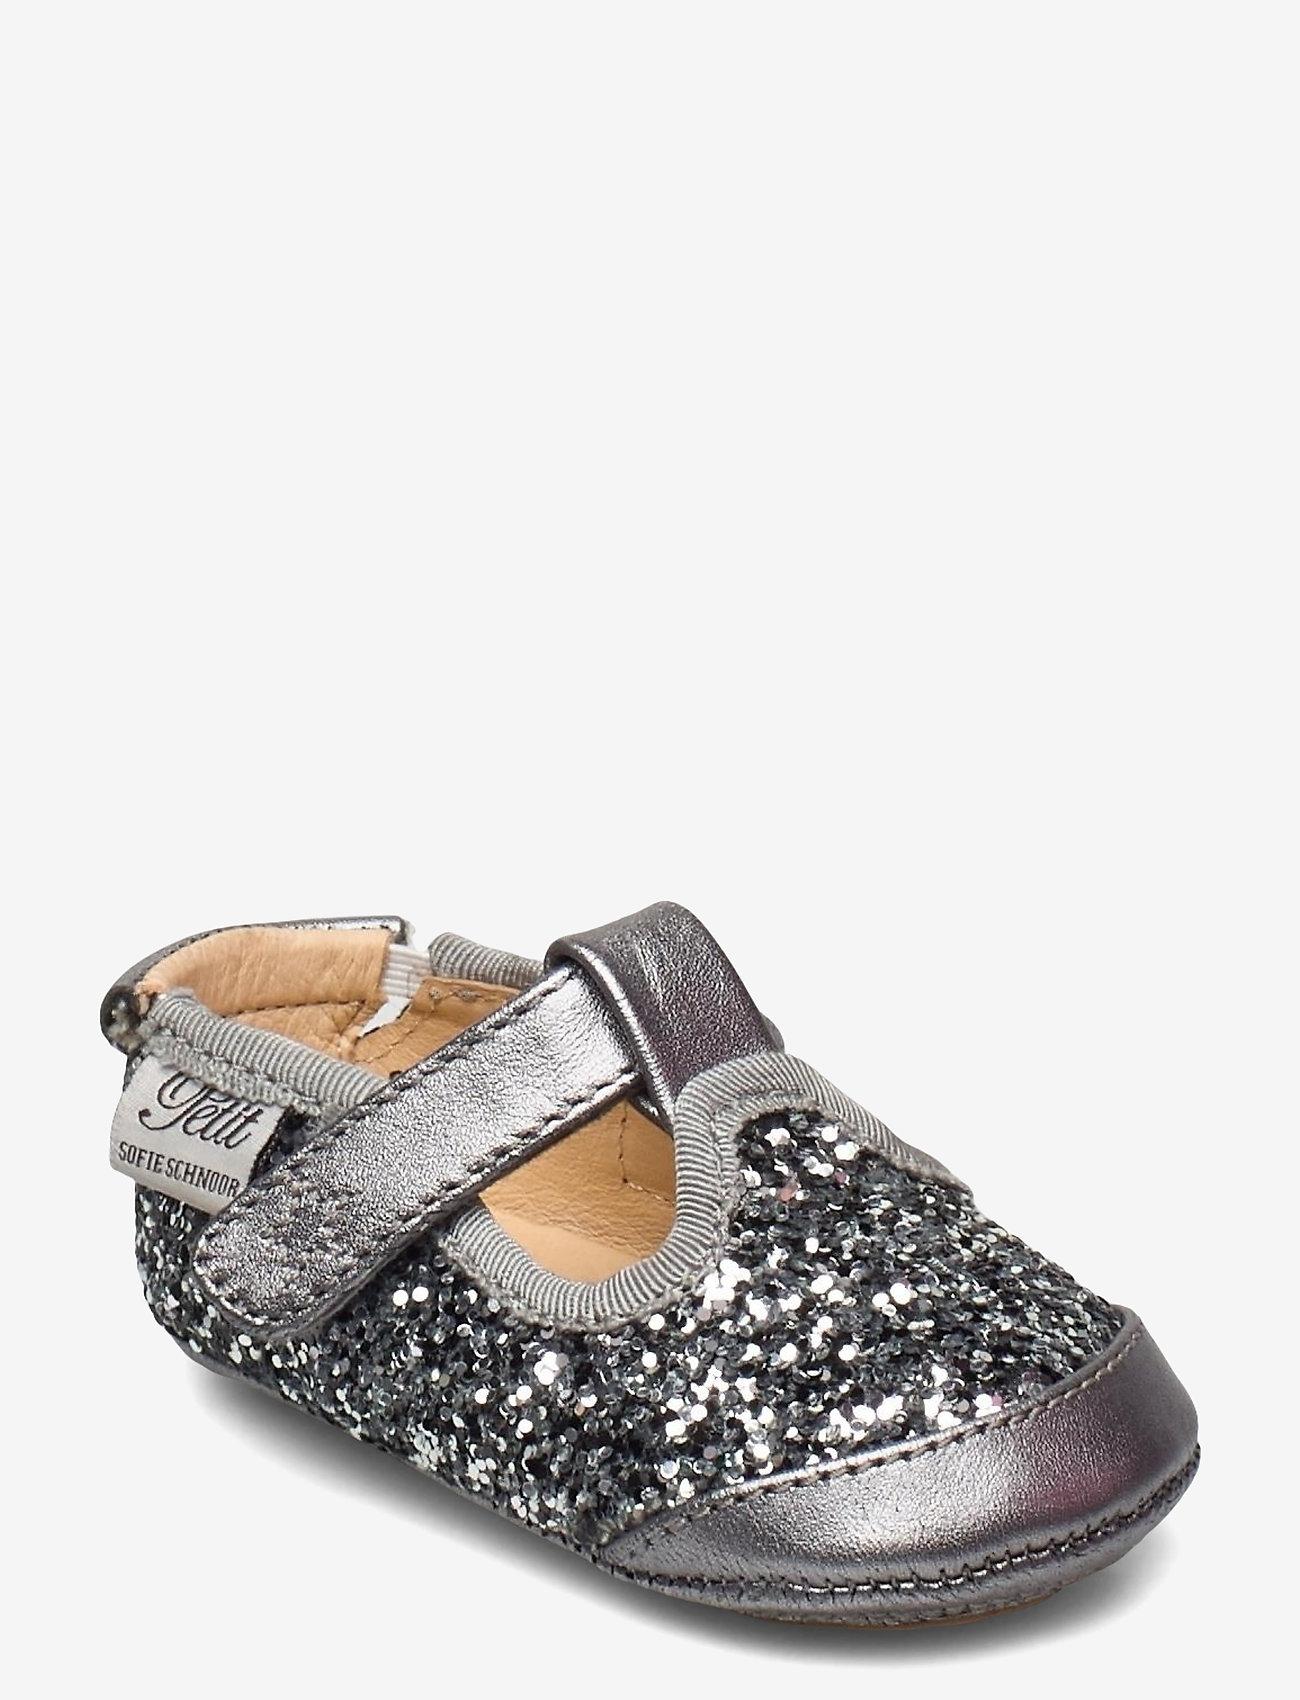 Baby glitter shoe 1